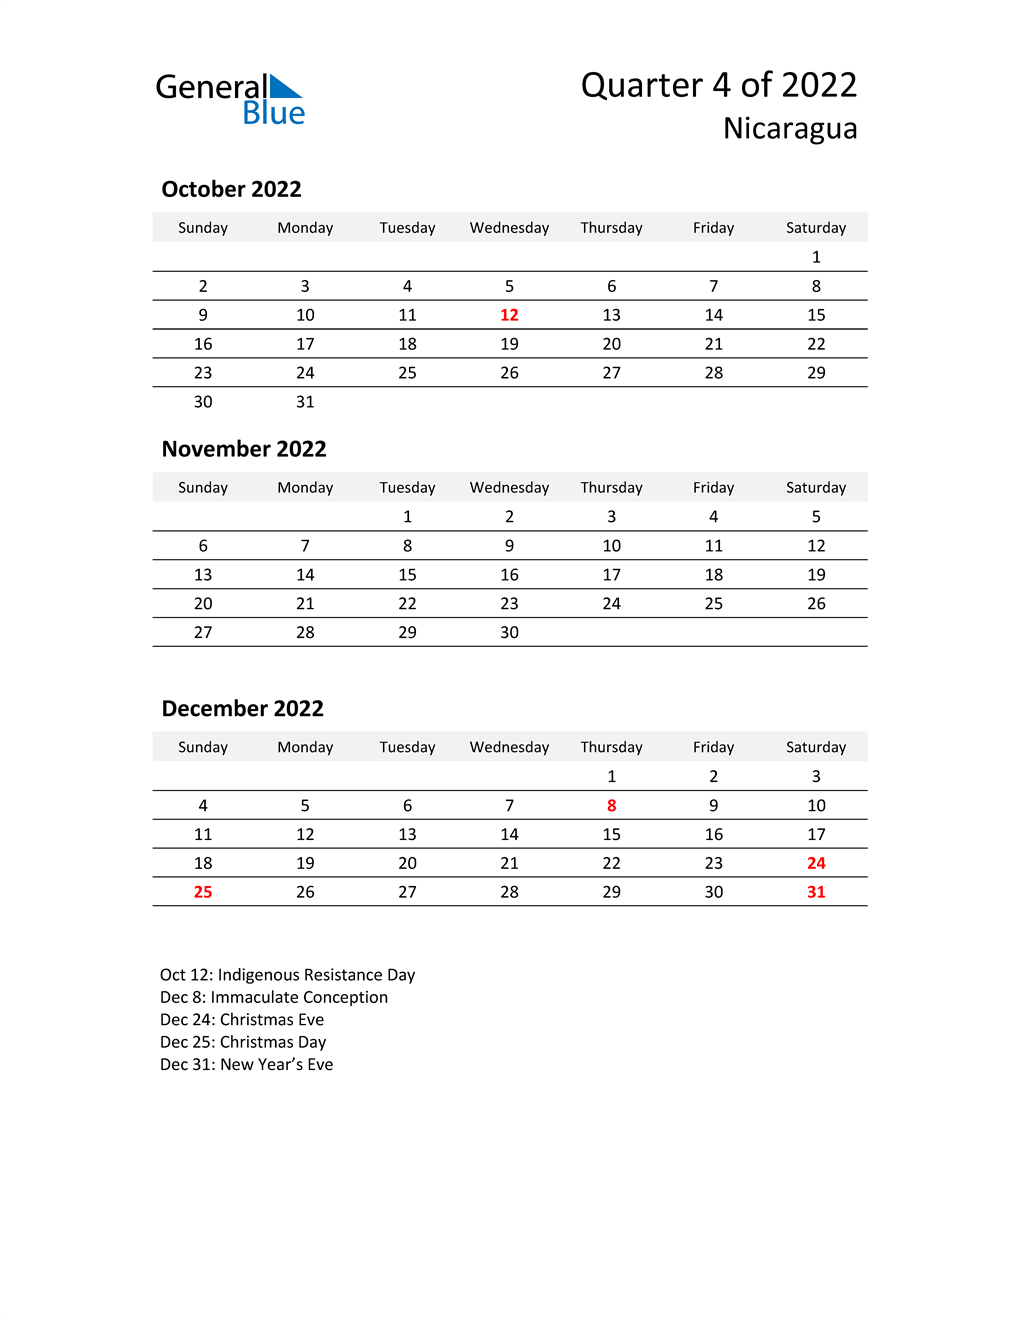 2022 Three-Month Calendar for Nicaragua